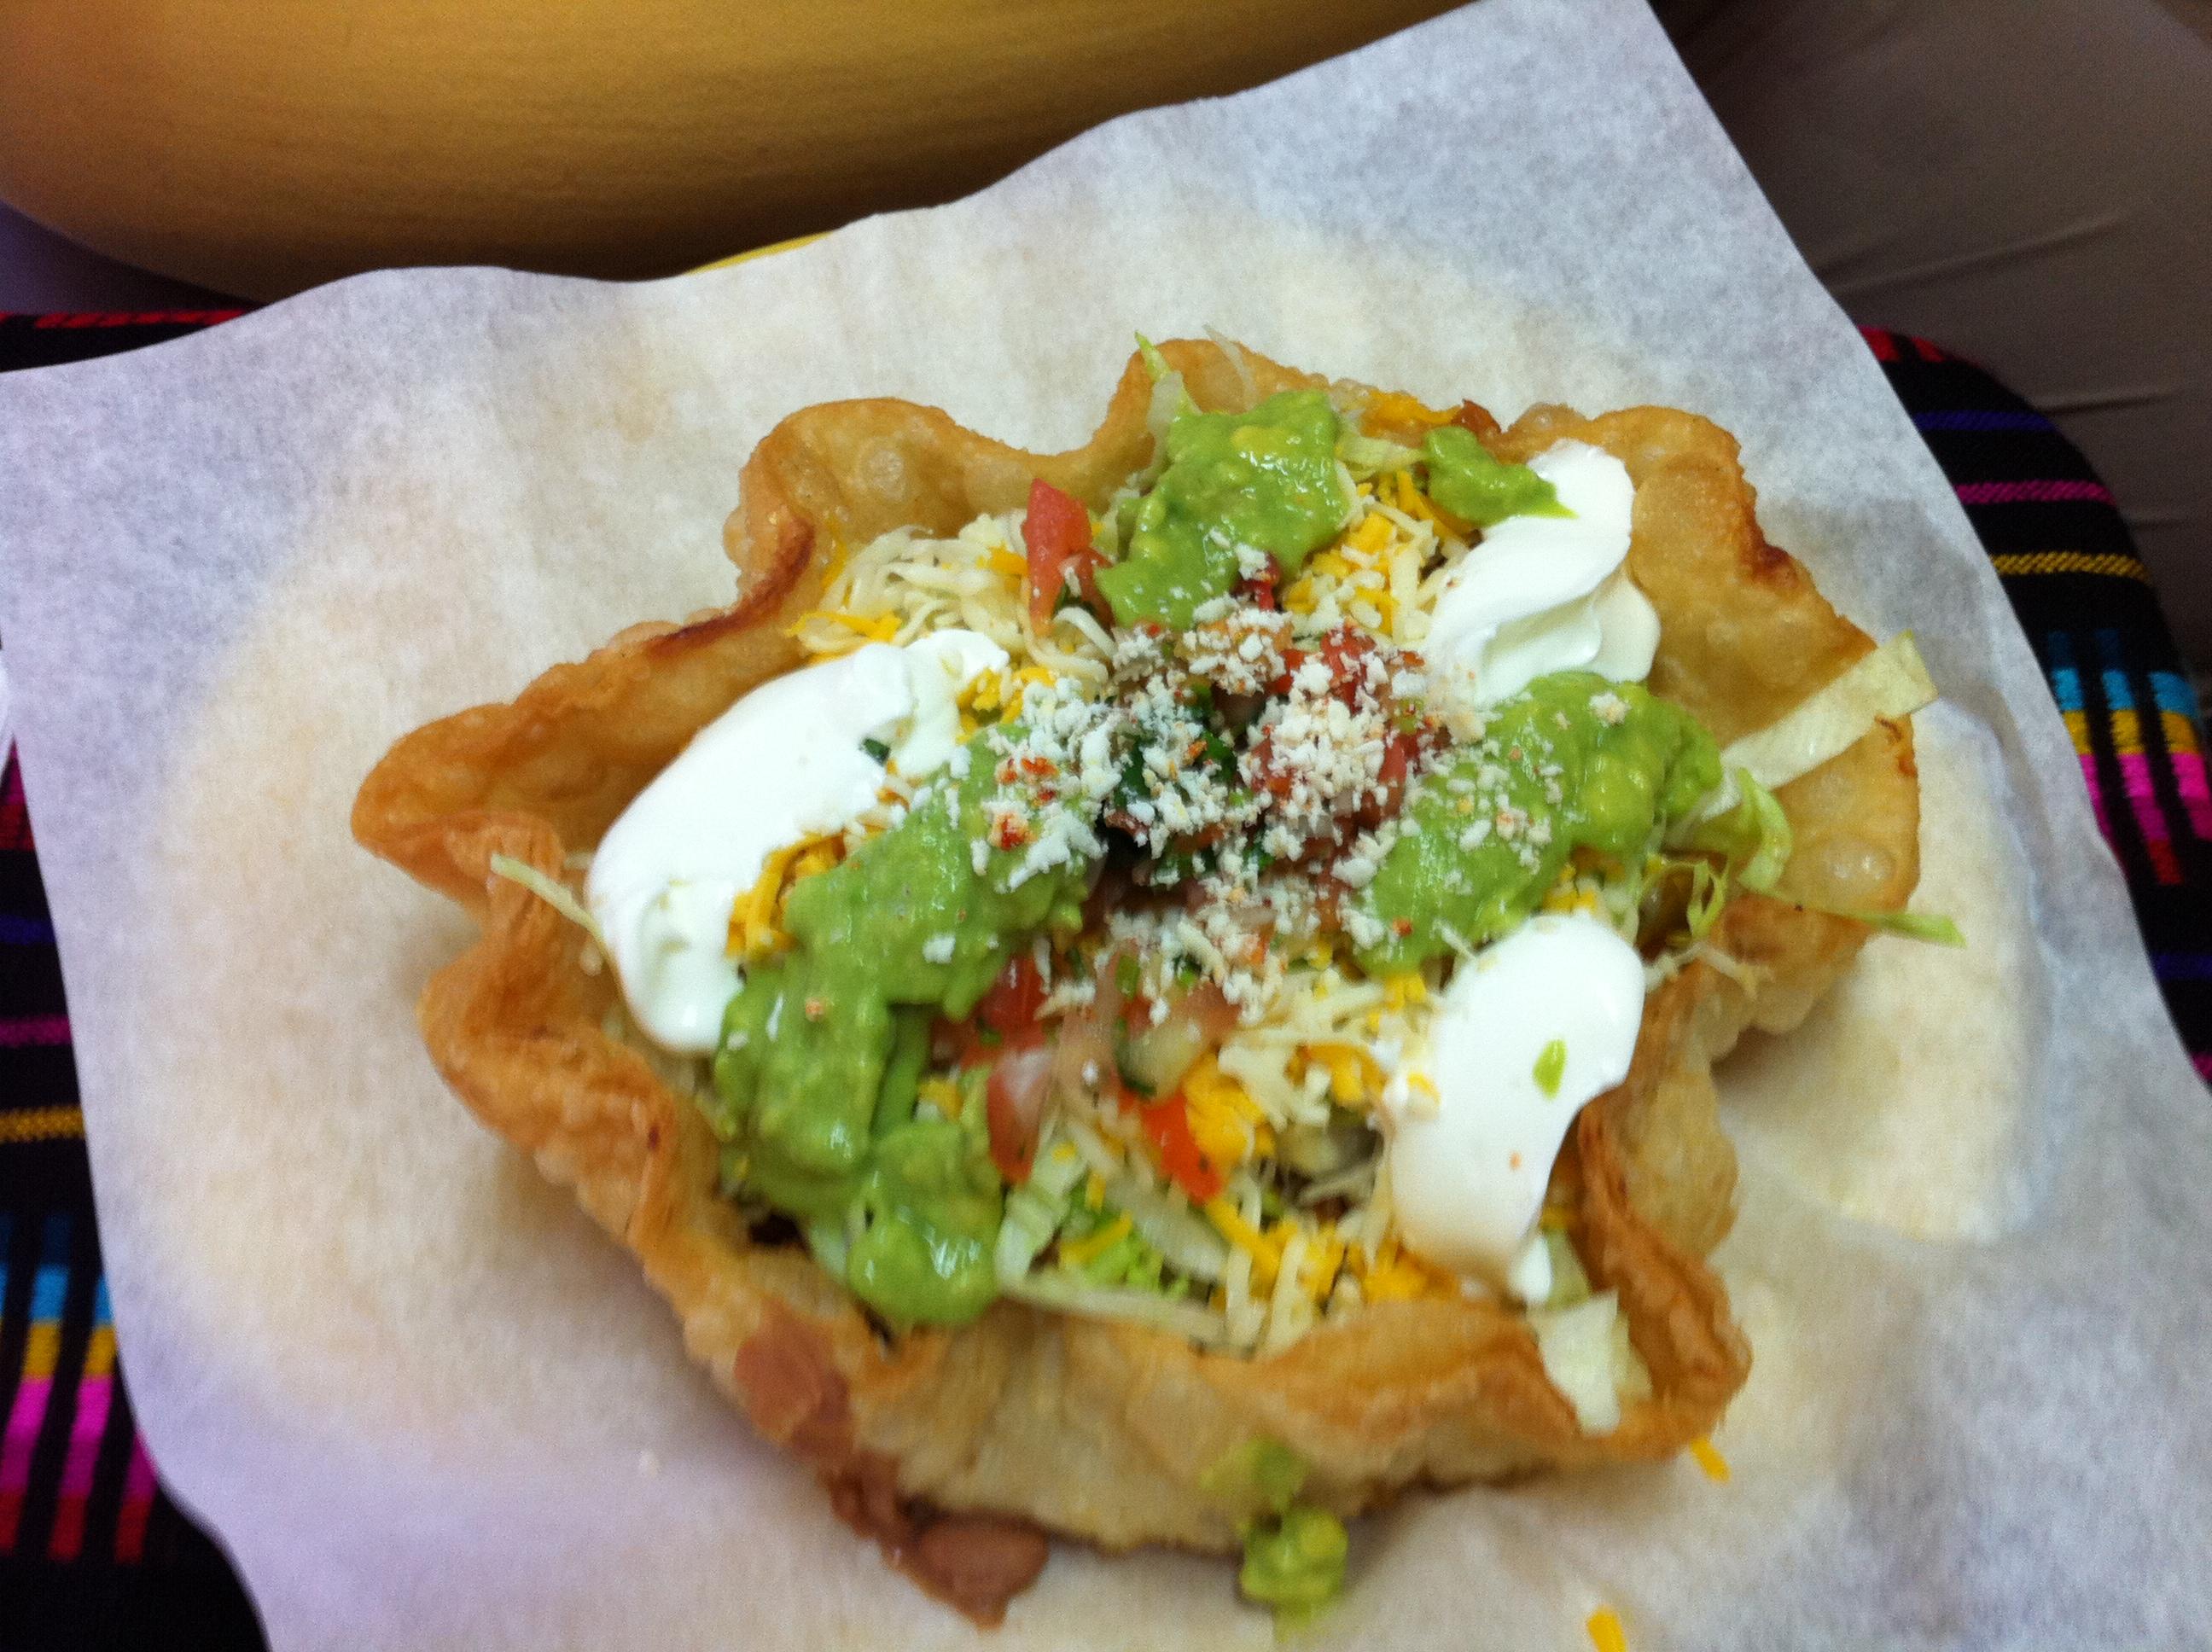 Guacamole Tacos With Tomatillo And Steak Sauce Recipes — Dishmaps